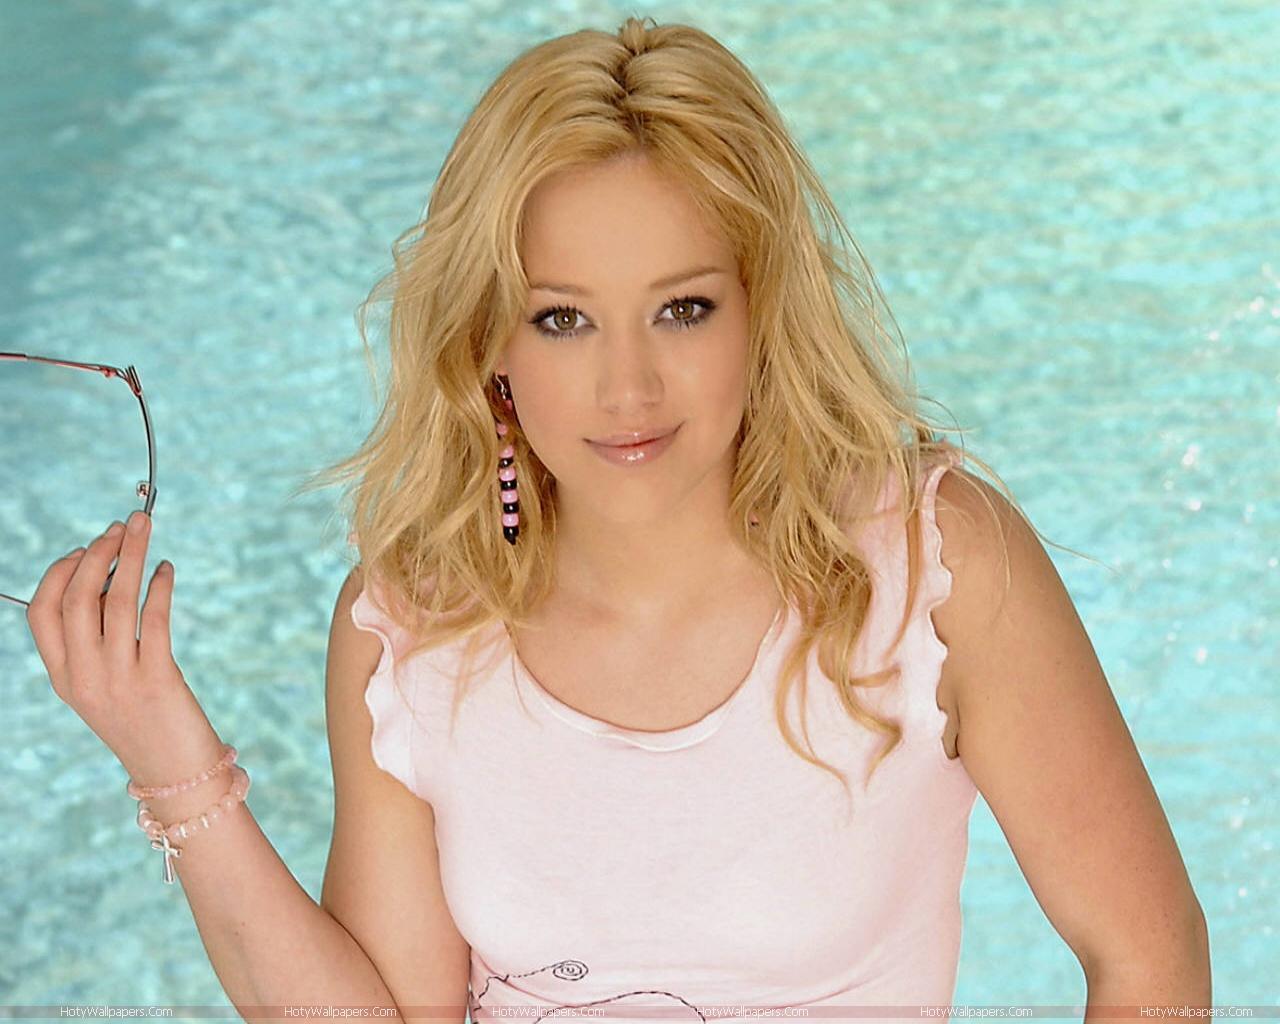 http://1.bp.blogspot.com/-mGJhB6KNi80/TmT0rsss4eI/AAAAAAAAKWA/m4C46hN3Fkc/s1600/Hilary_Duff-wallpaper.jpg